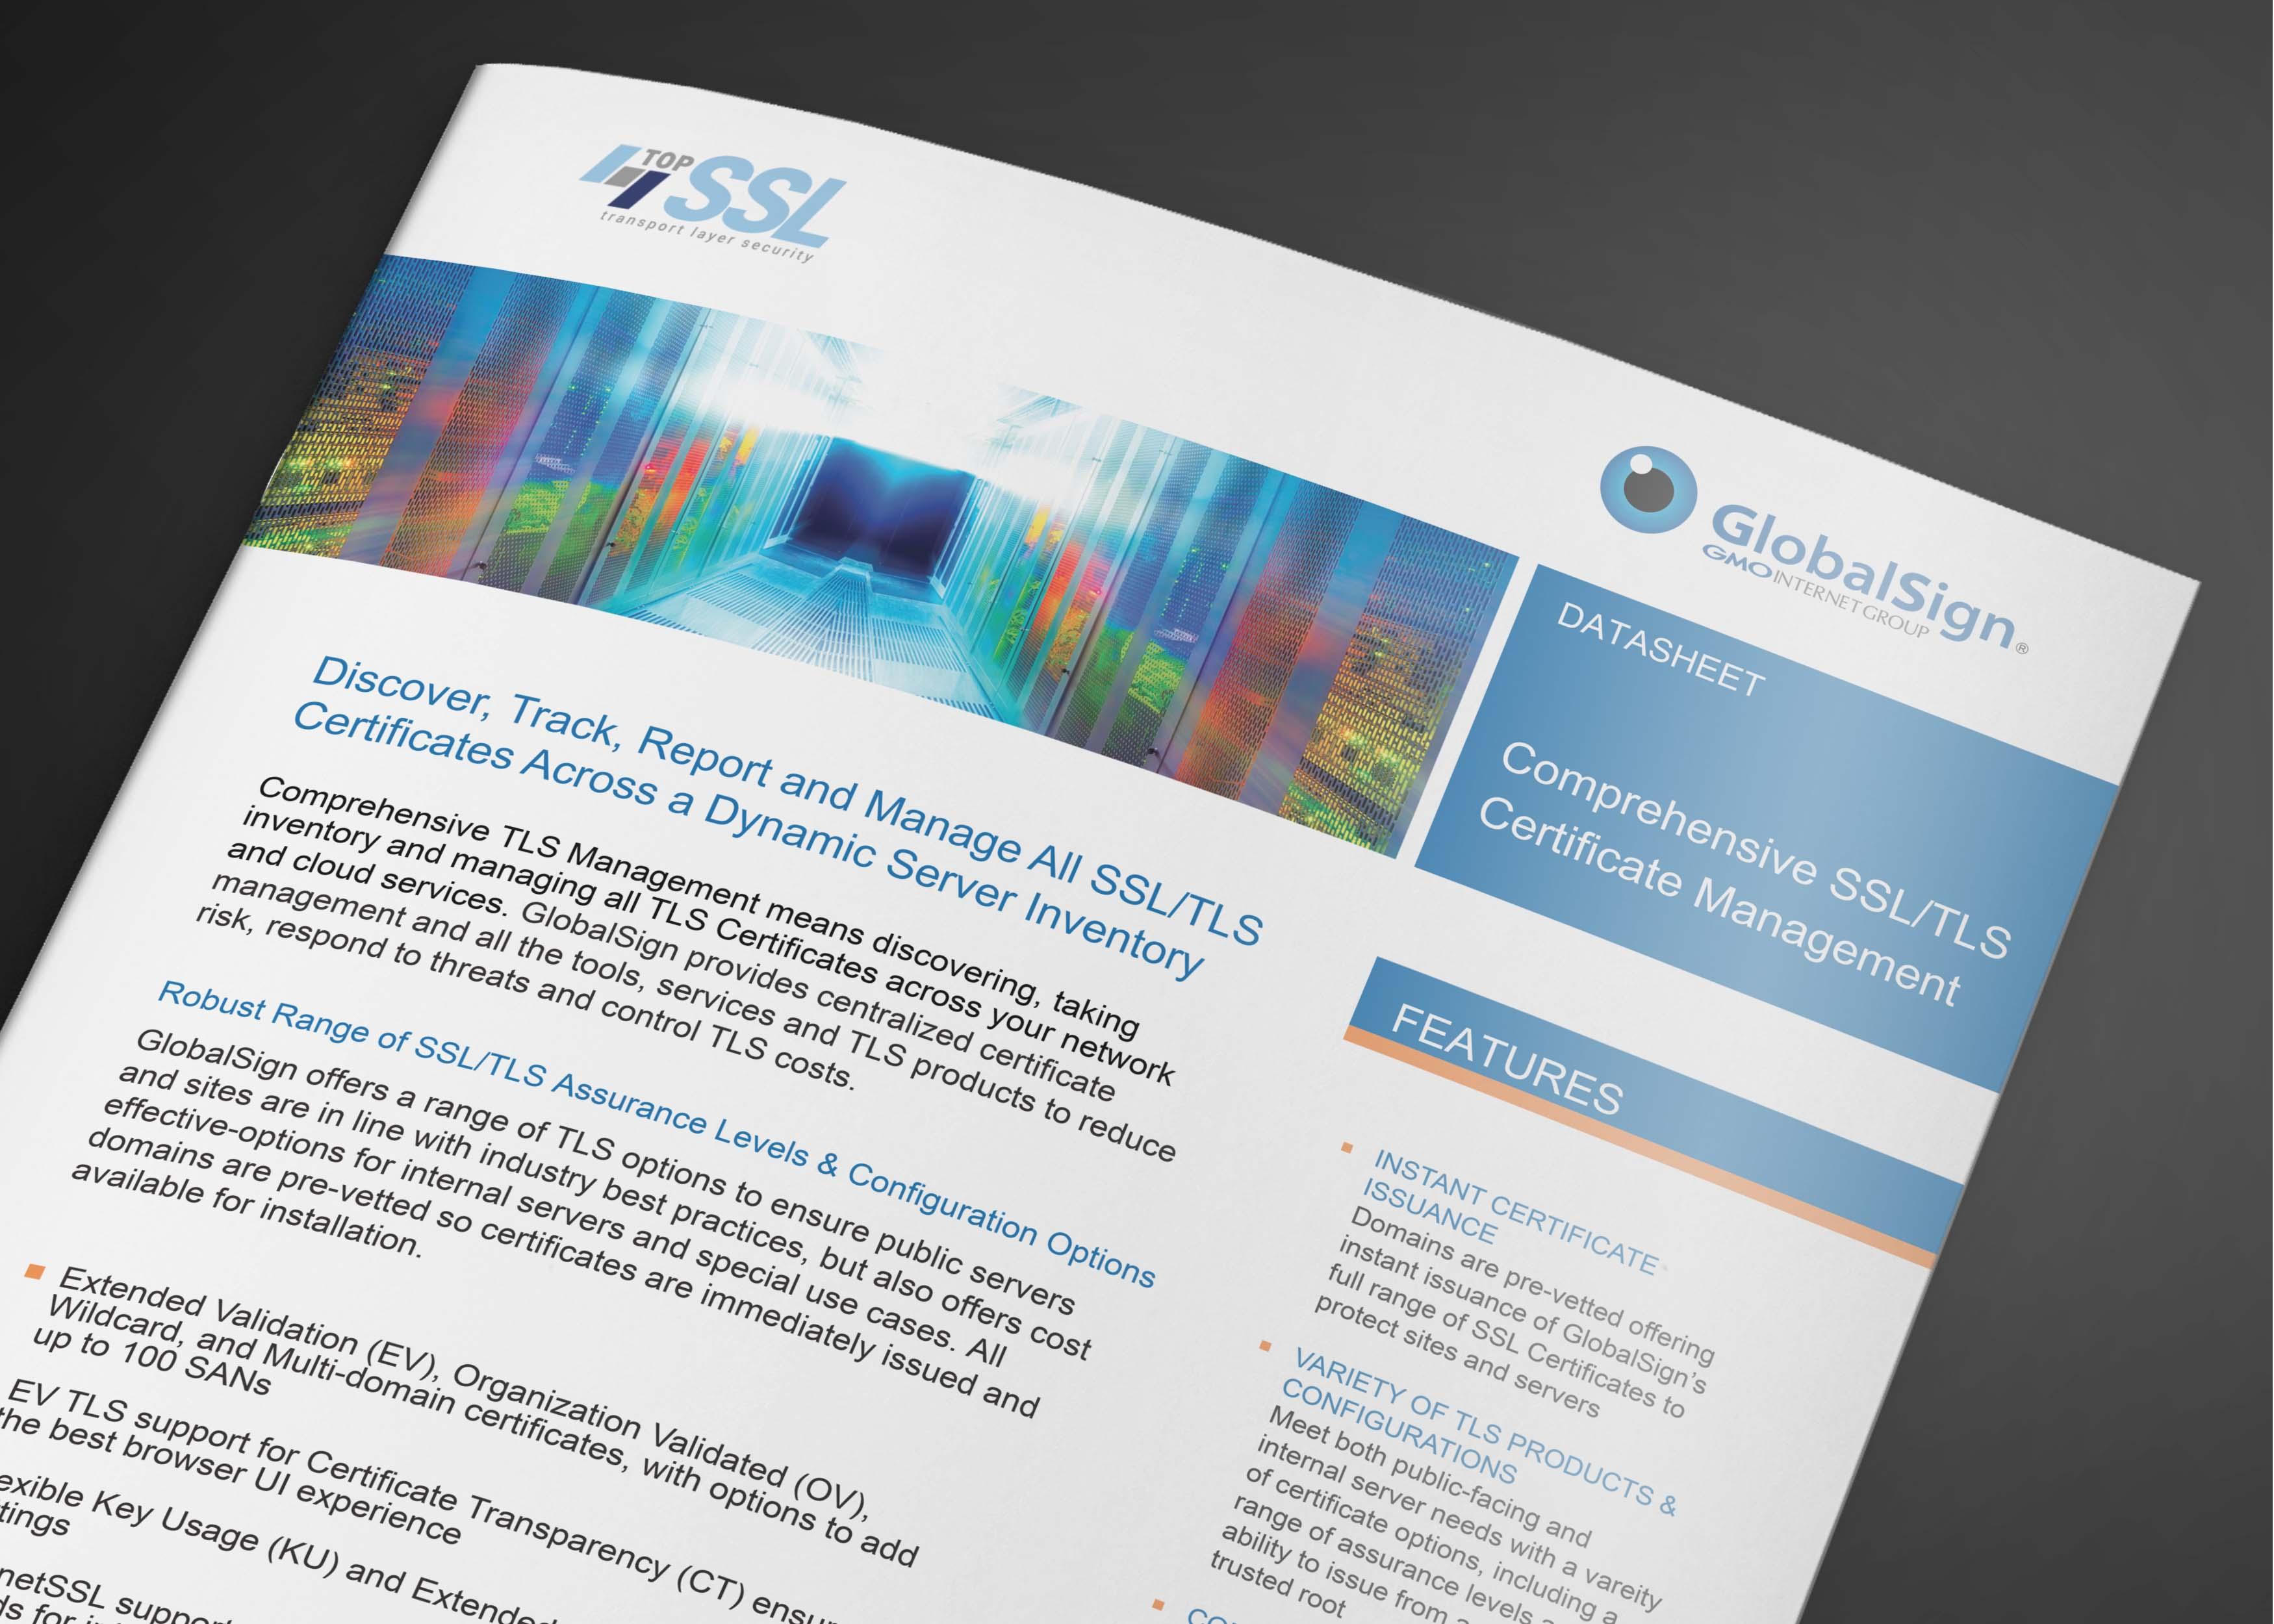 Comprehensive SSL Certificate Management - Top SSL